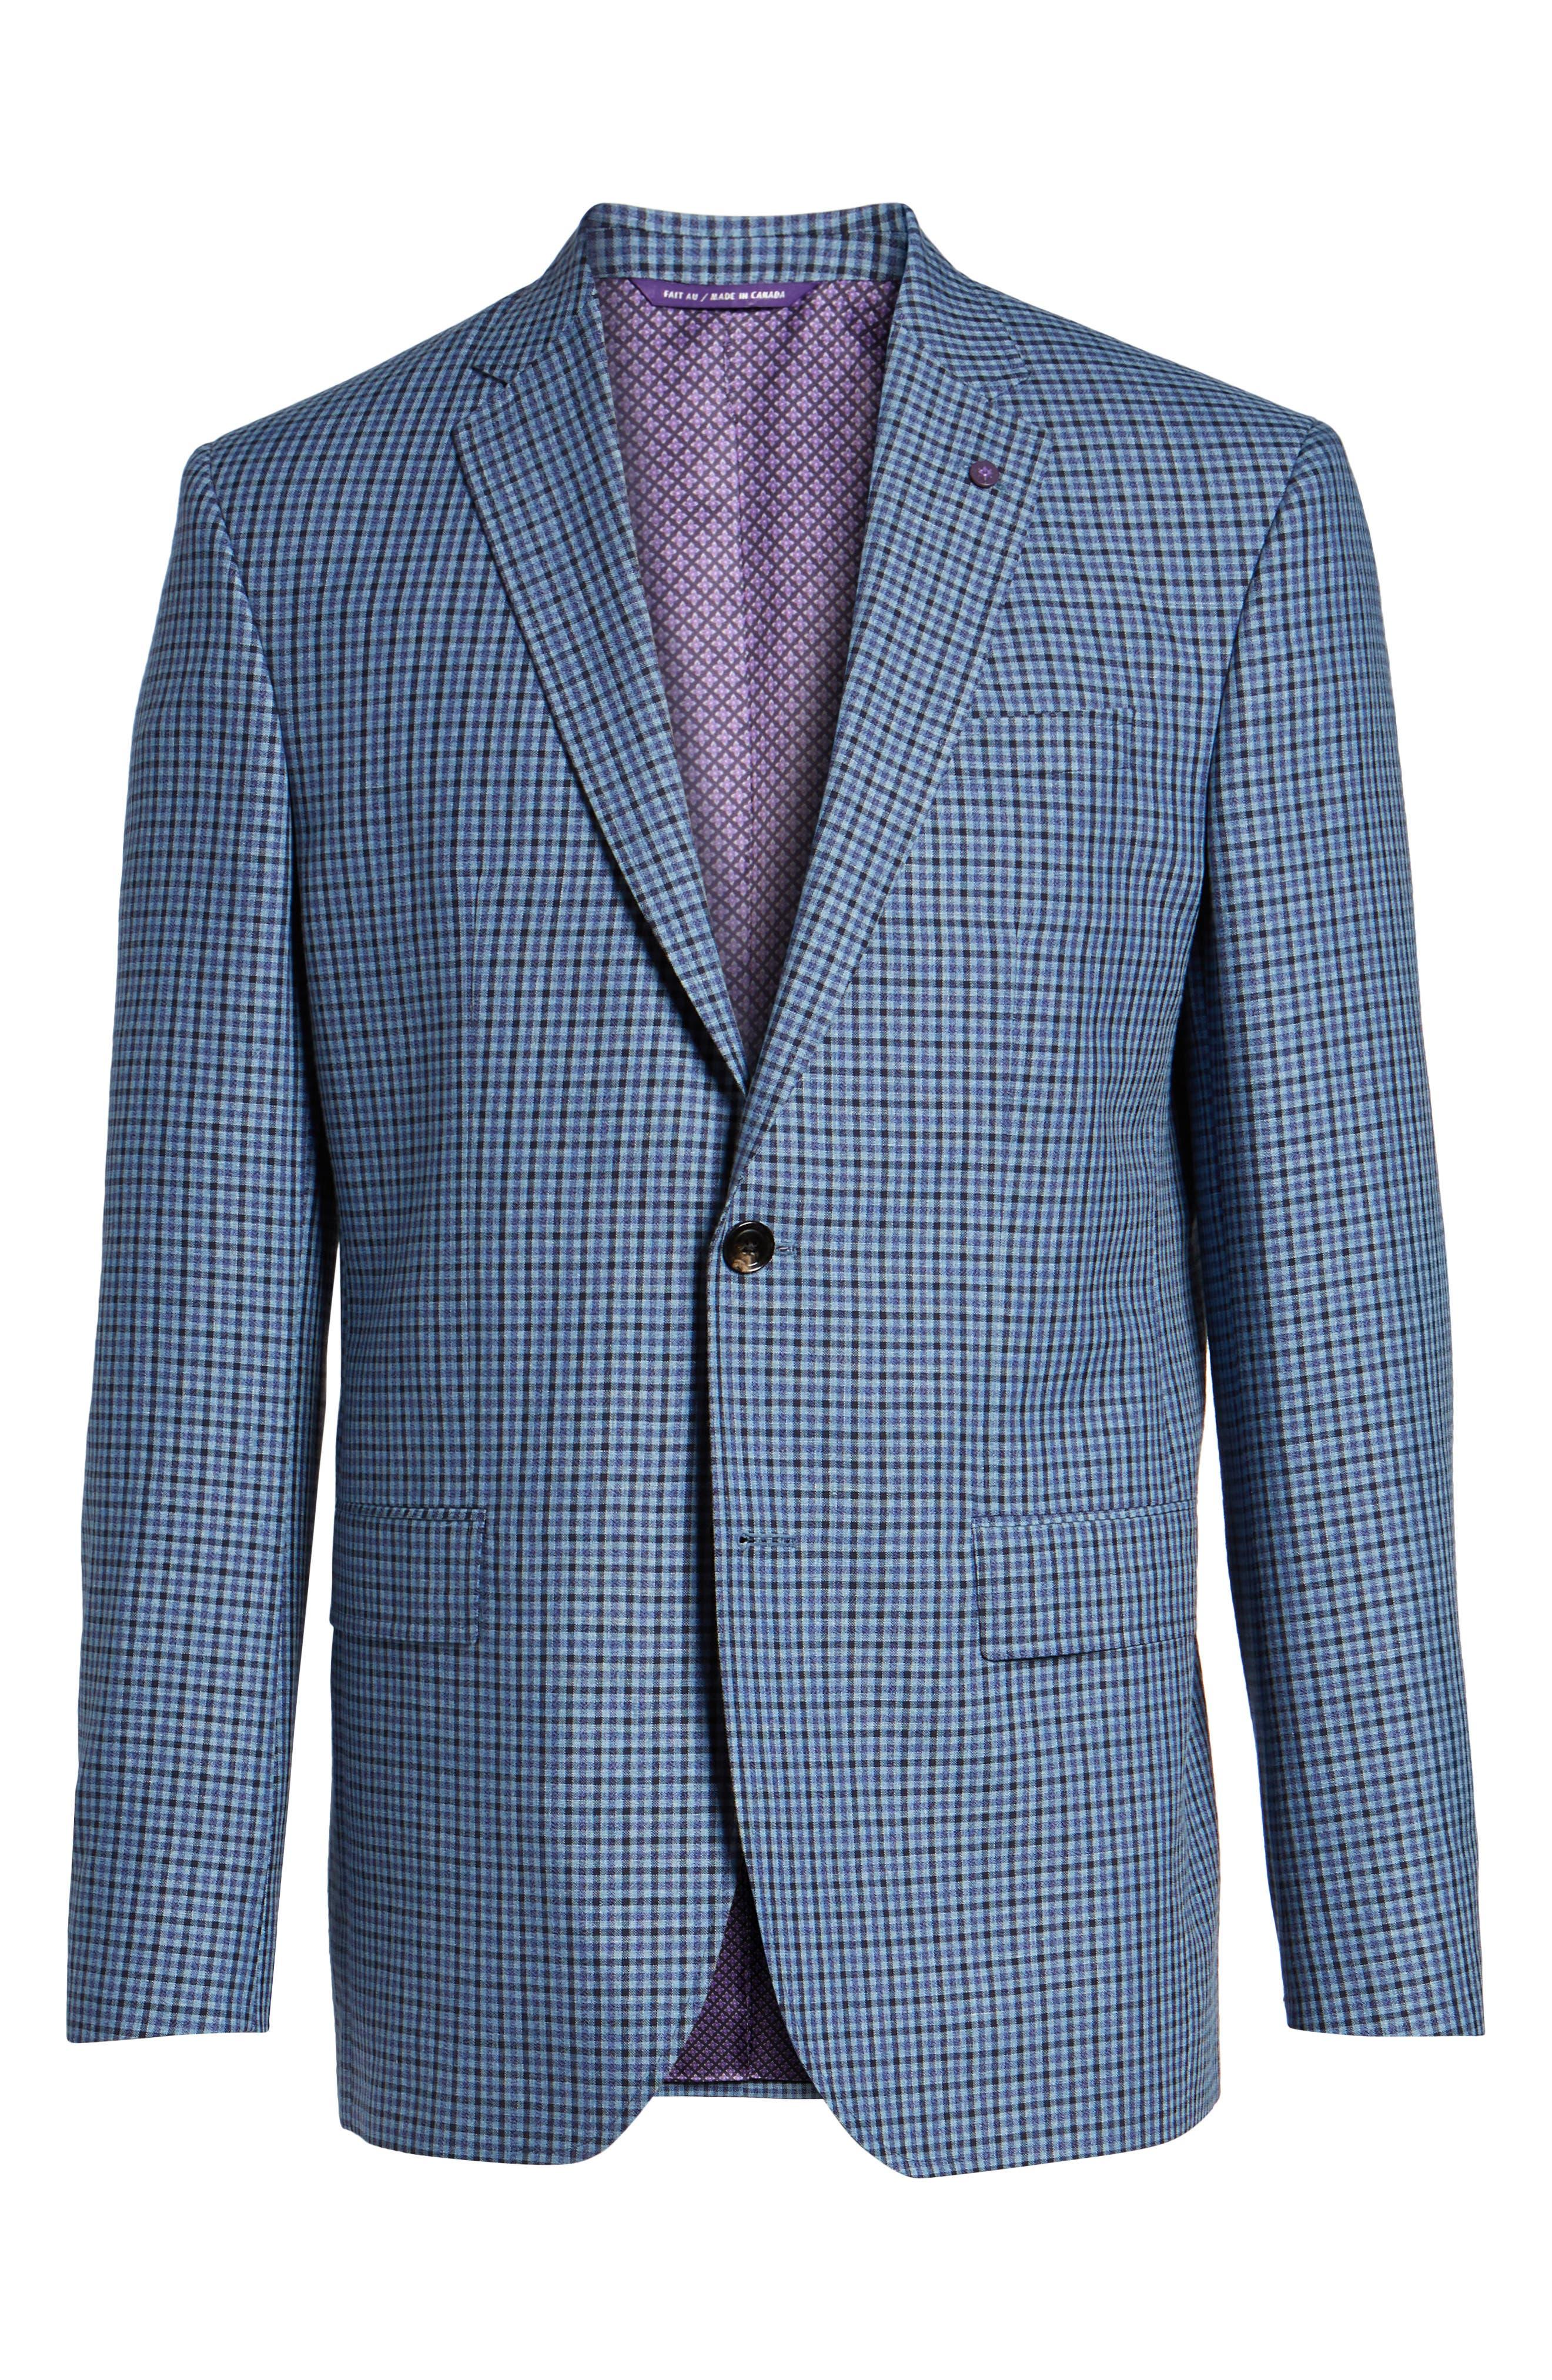 Jay Trim Fit Check Wool & Linen Sport Coat,                             Alternate thumbnail 5, color,                             400